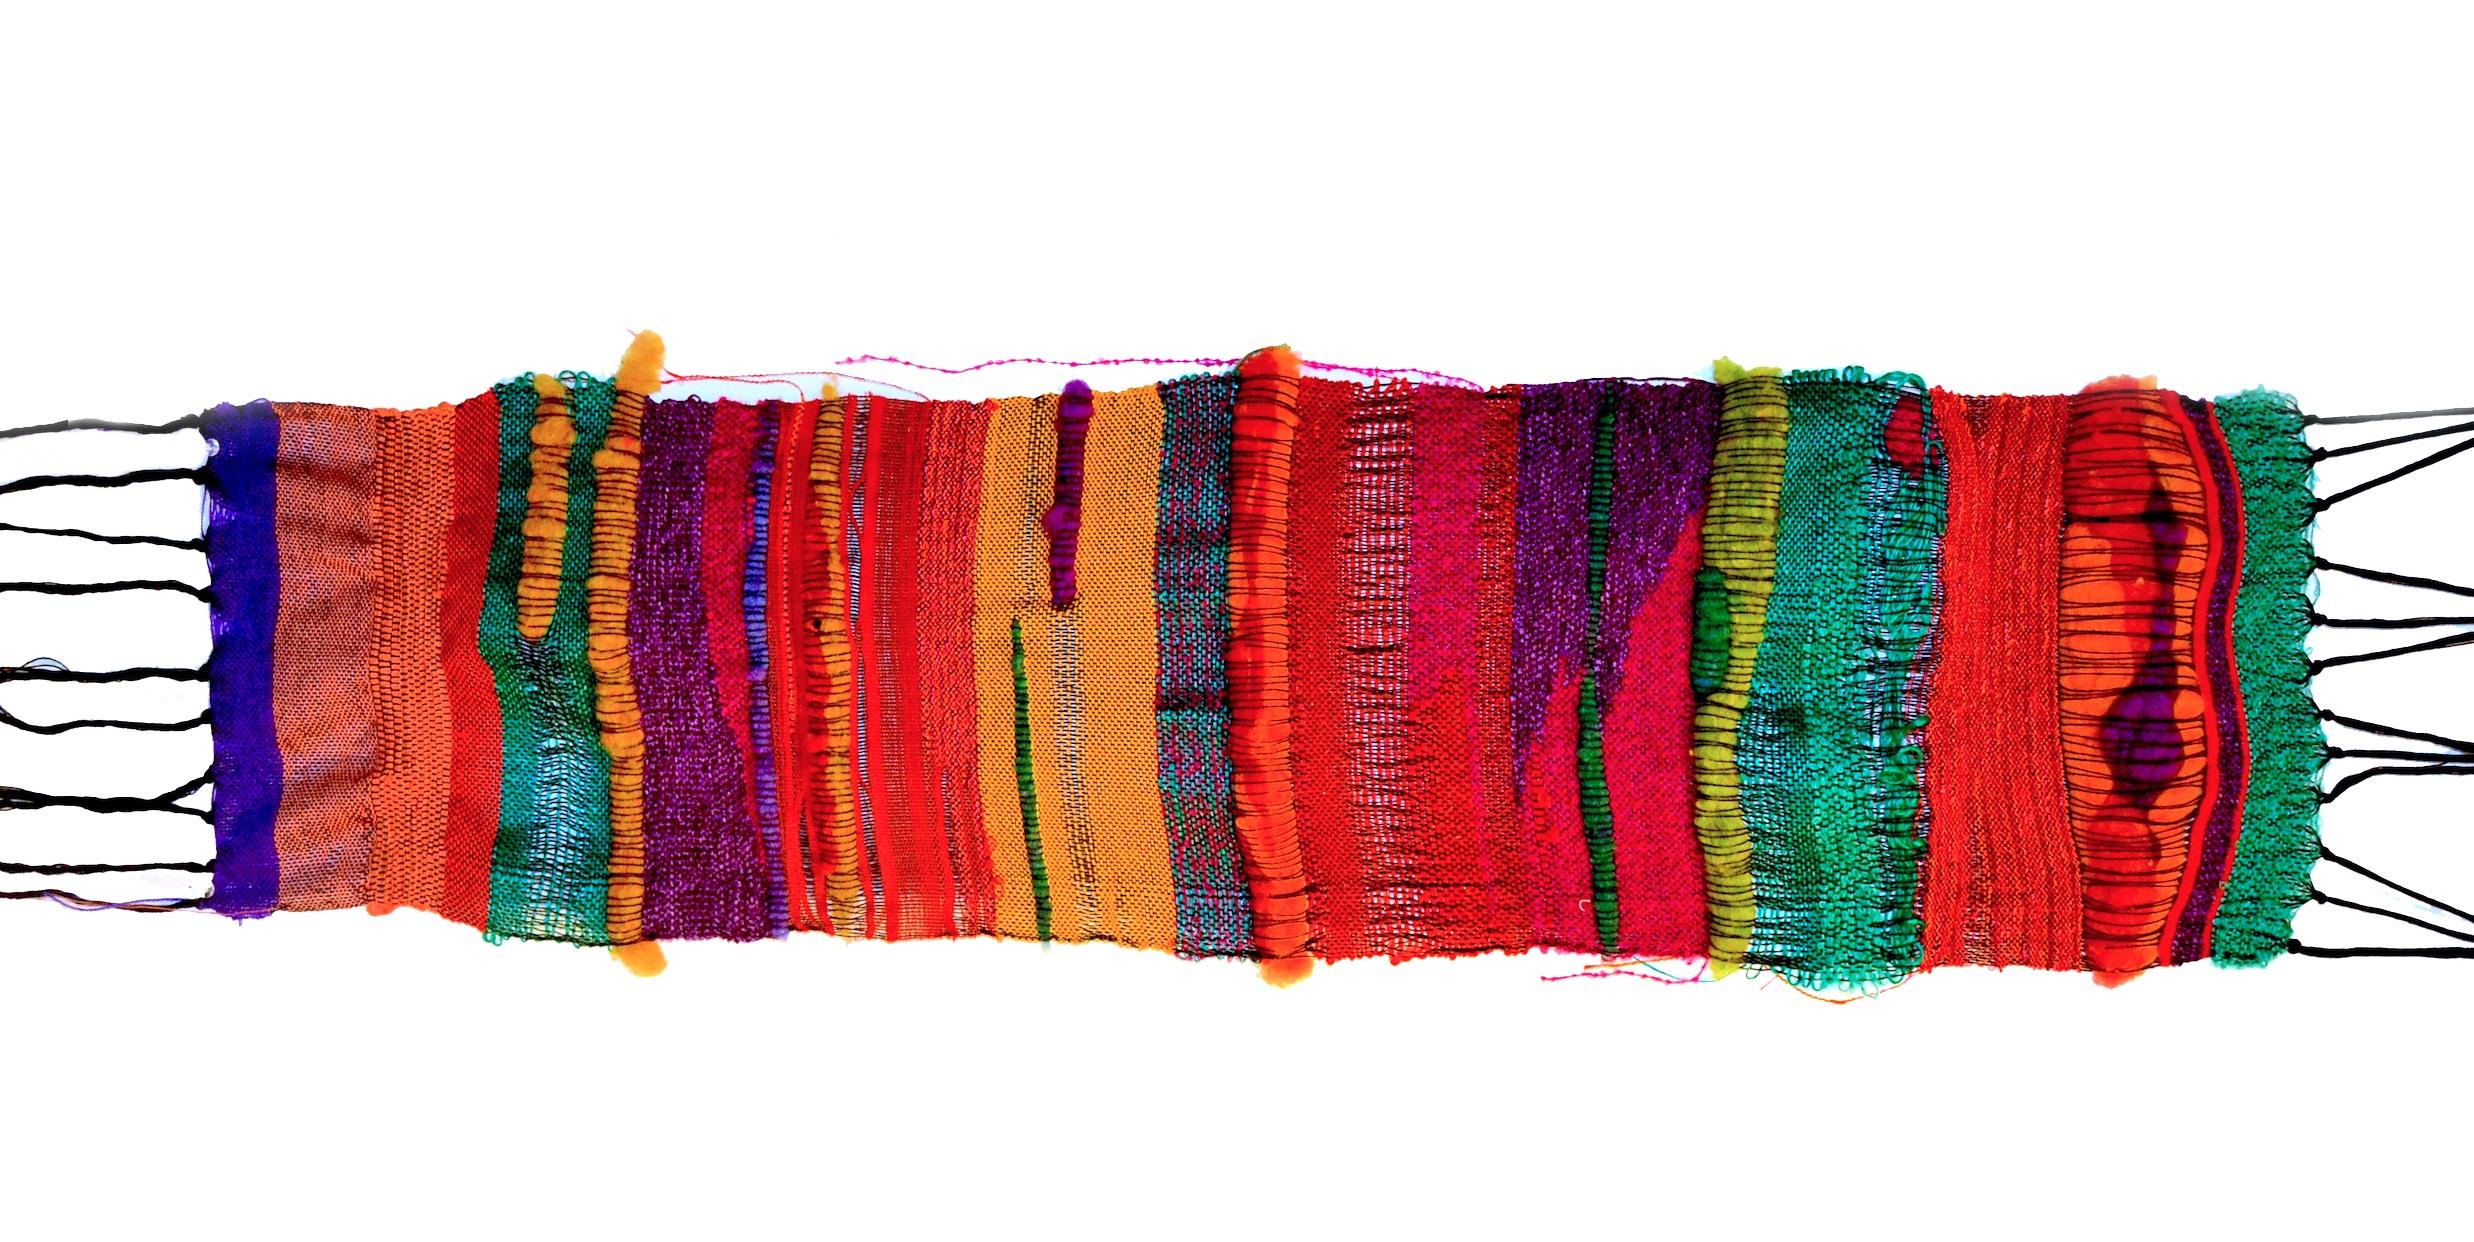 Aliana+Grace+Bailey_SAORI+Weaving+9.jpg